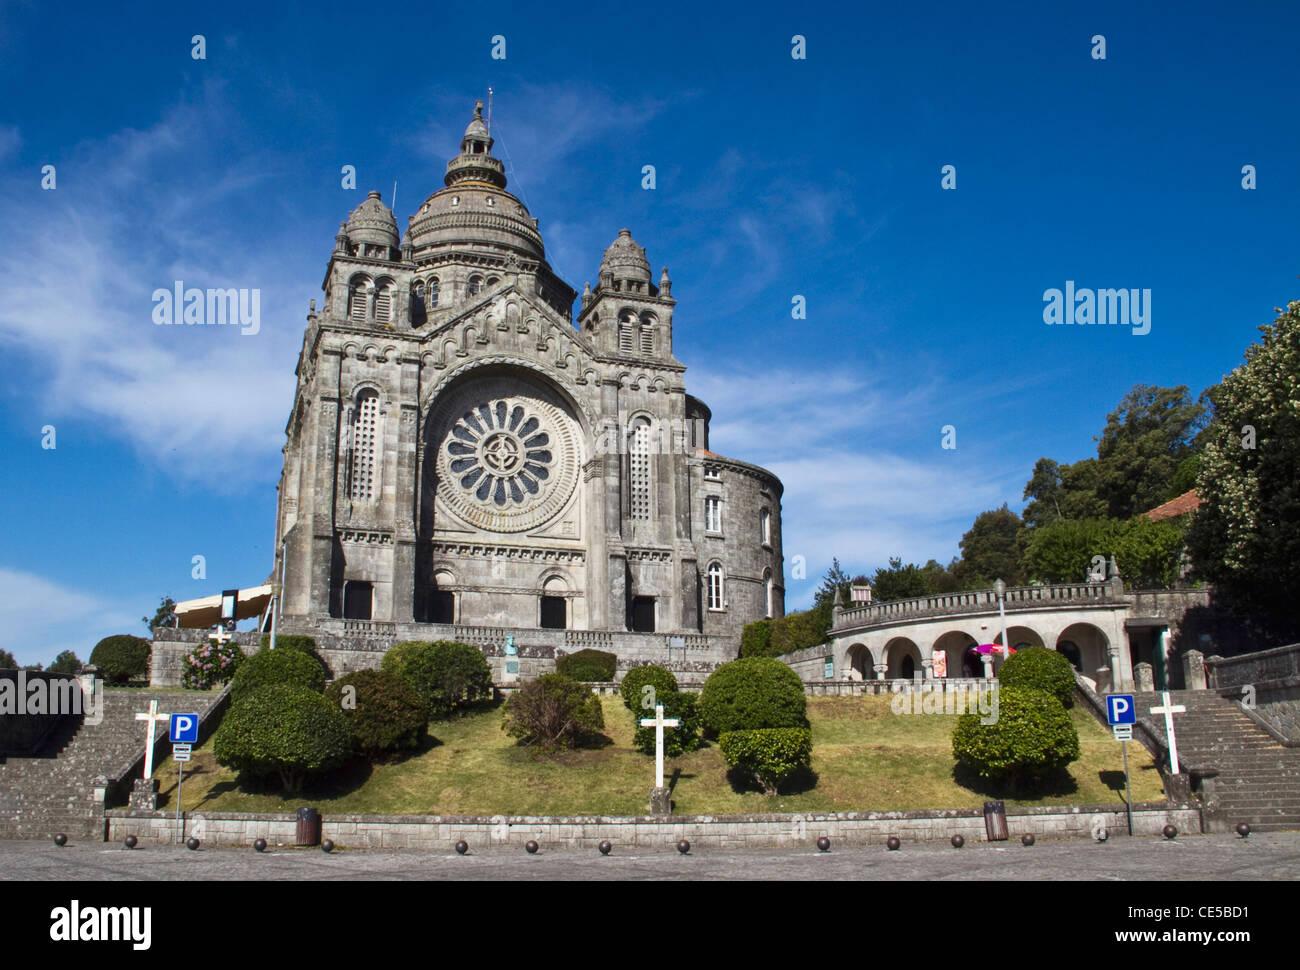 Portugal, Viana do Castelo.  The Basilica de Santa Luzia was built in 1919 on a hill above the town Stock Photo